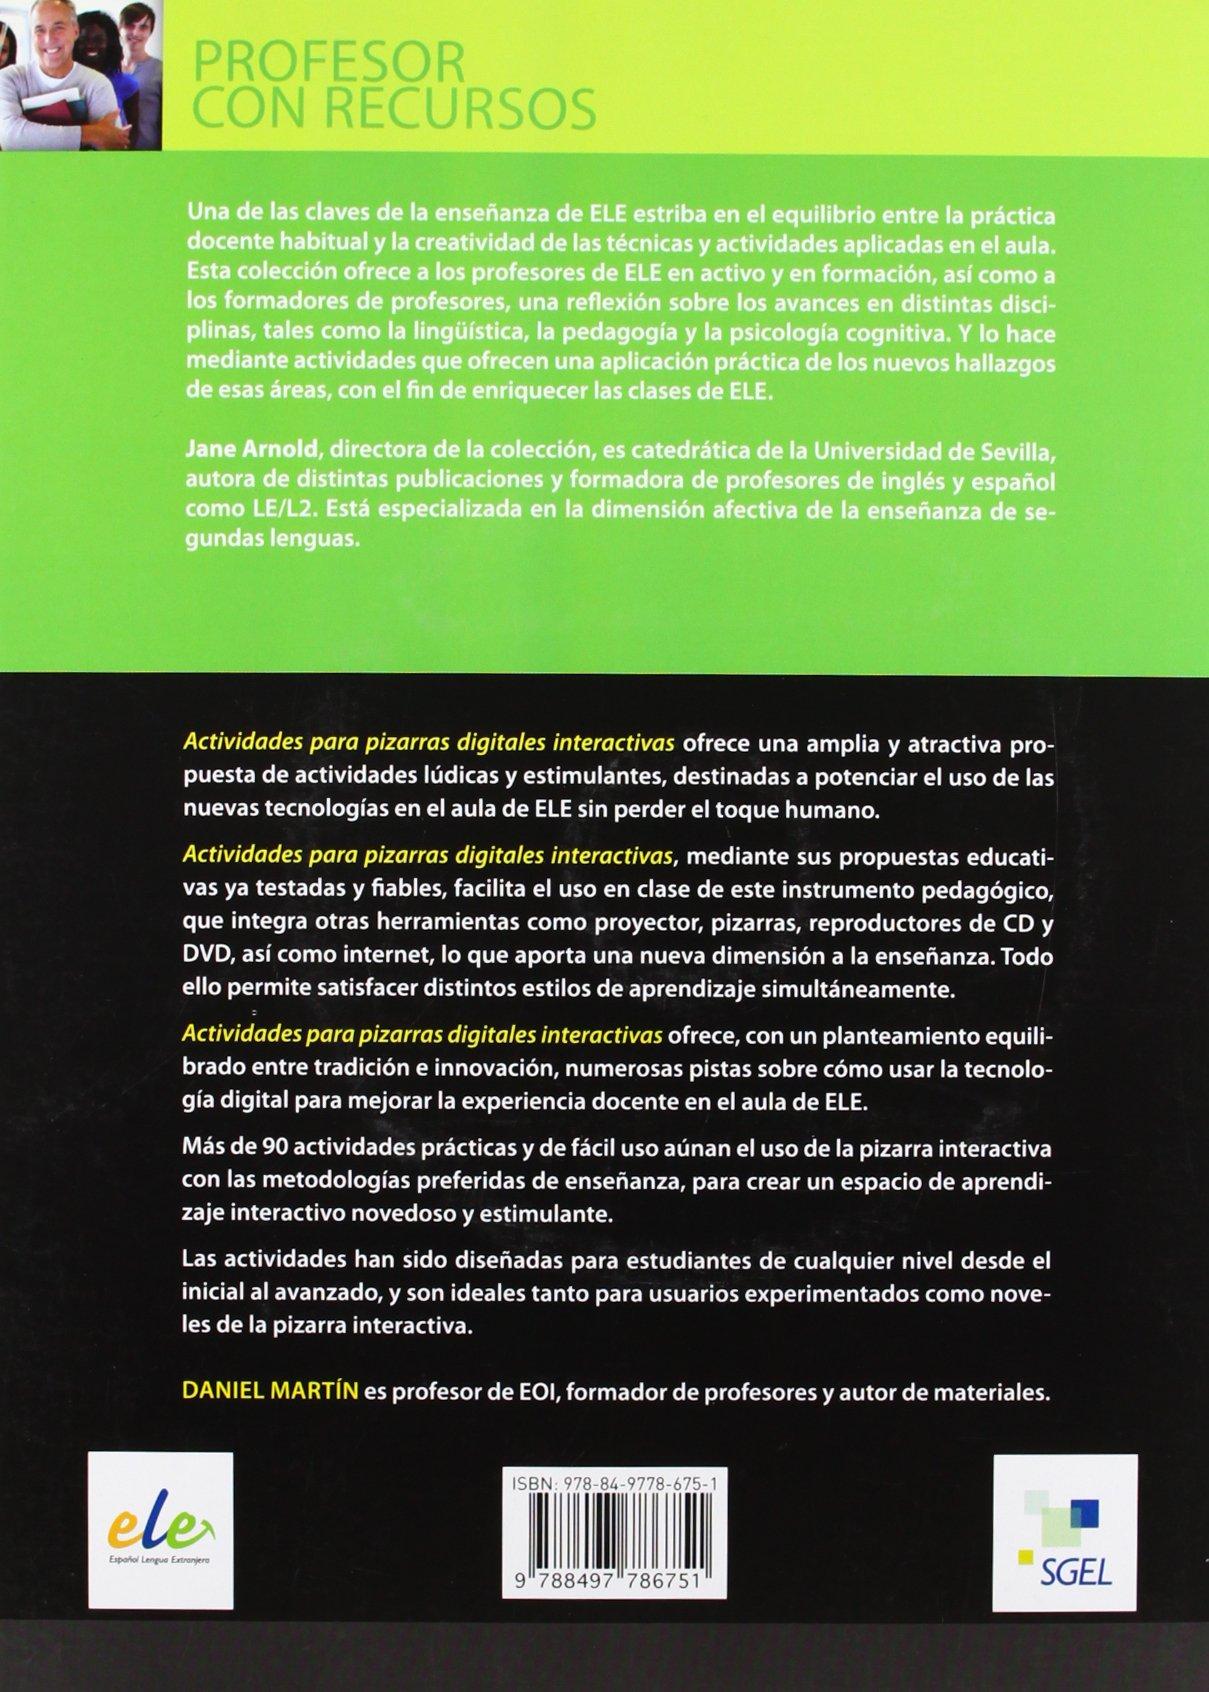 Recursos Profesor: Actividades Pizarras Digitales (Profesor Con ...